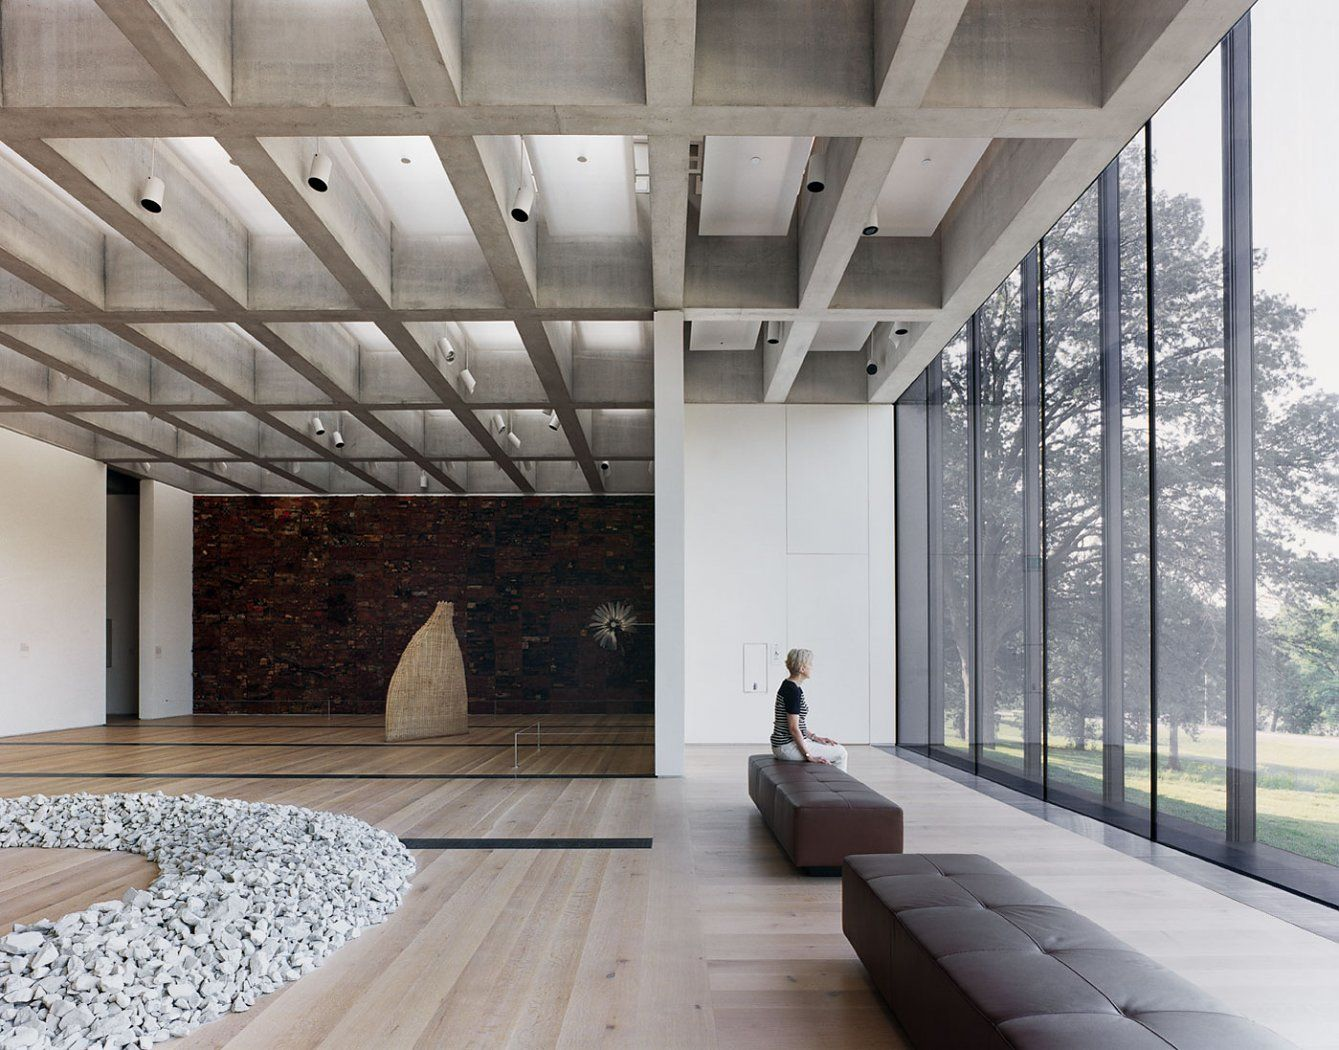 Top Interior Designers David chipperfield architects Art museum